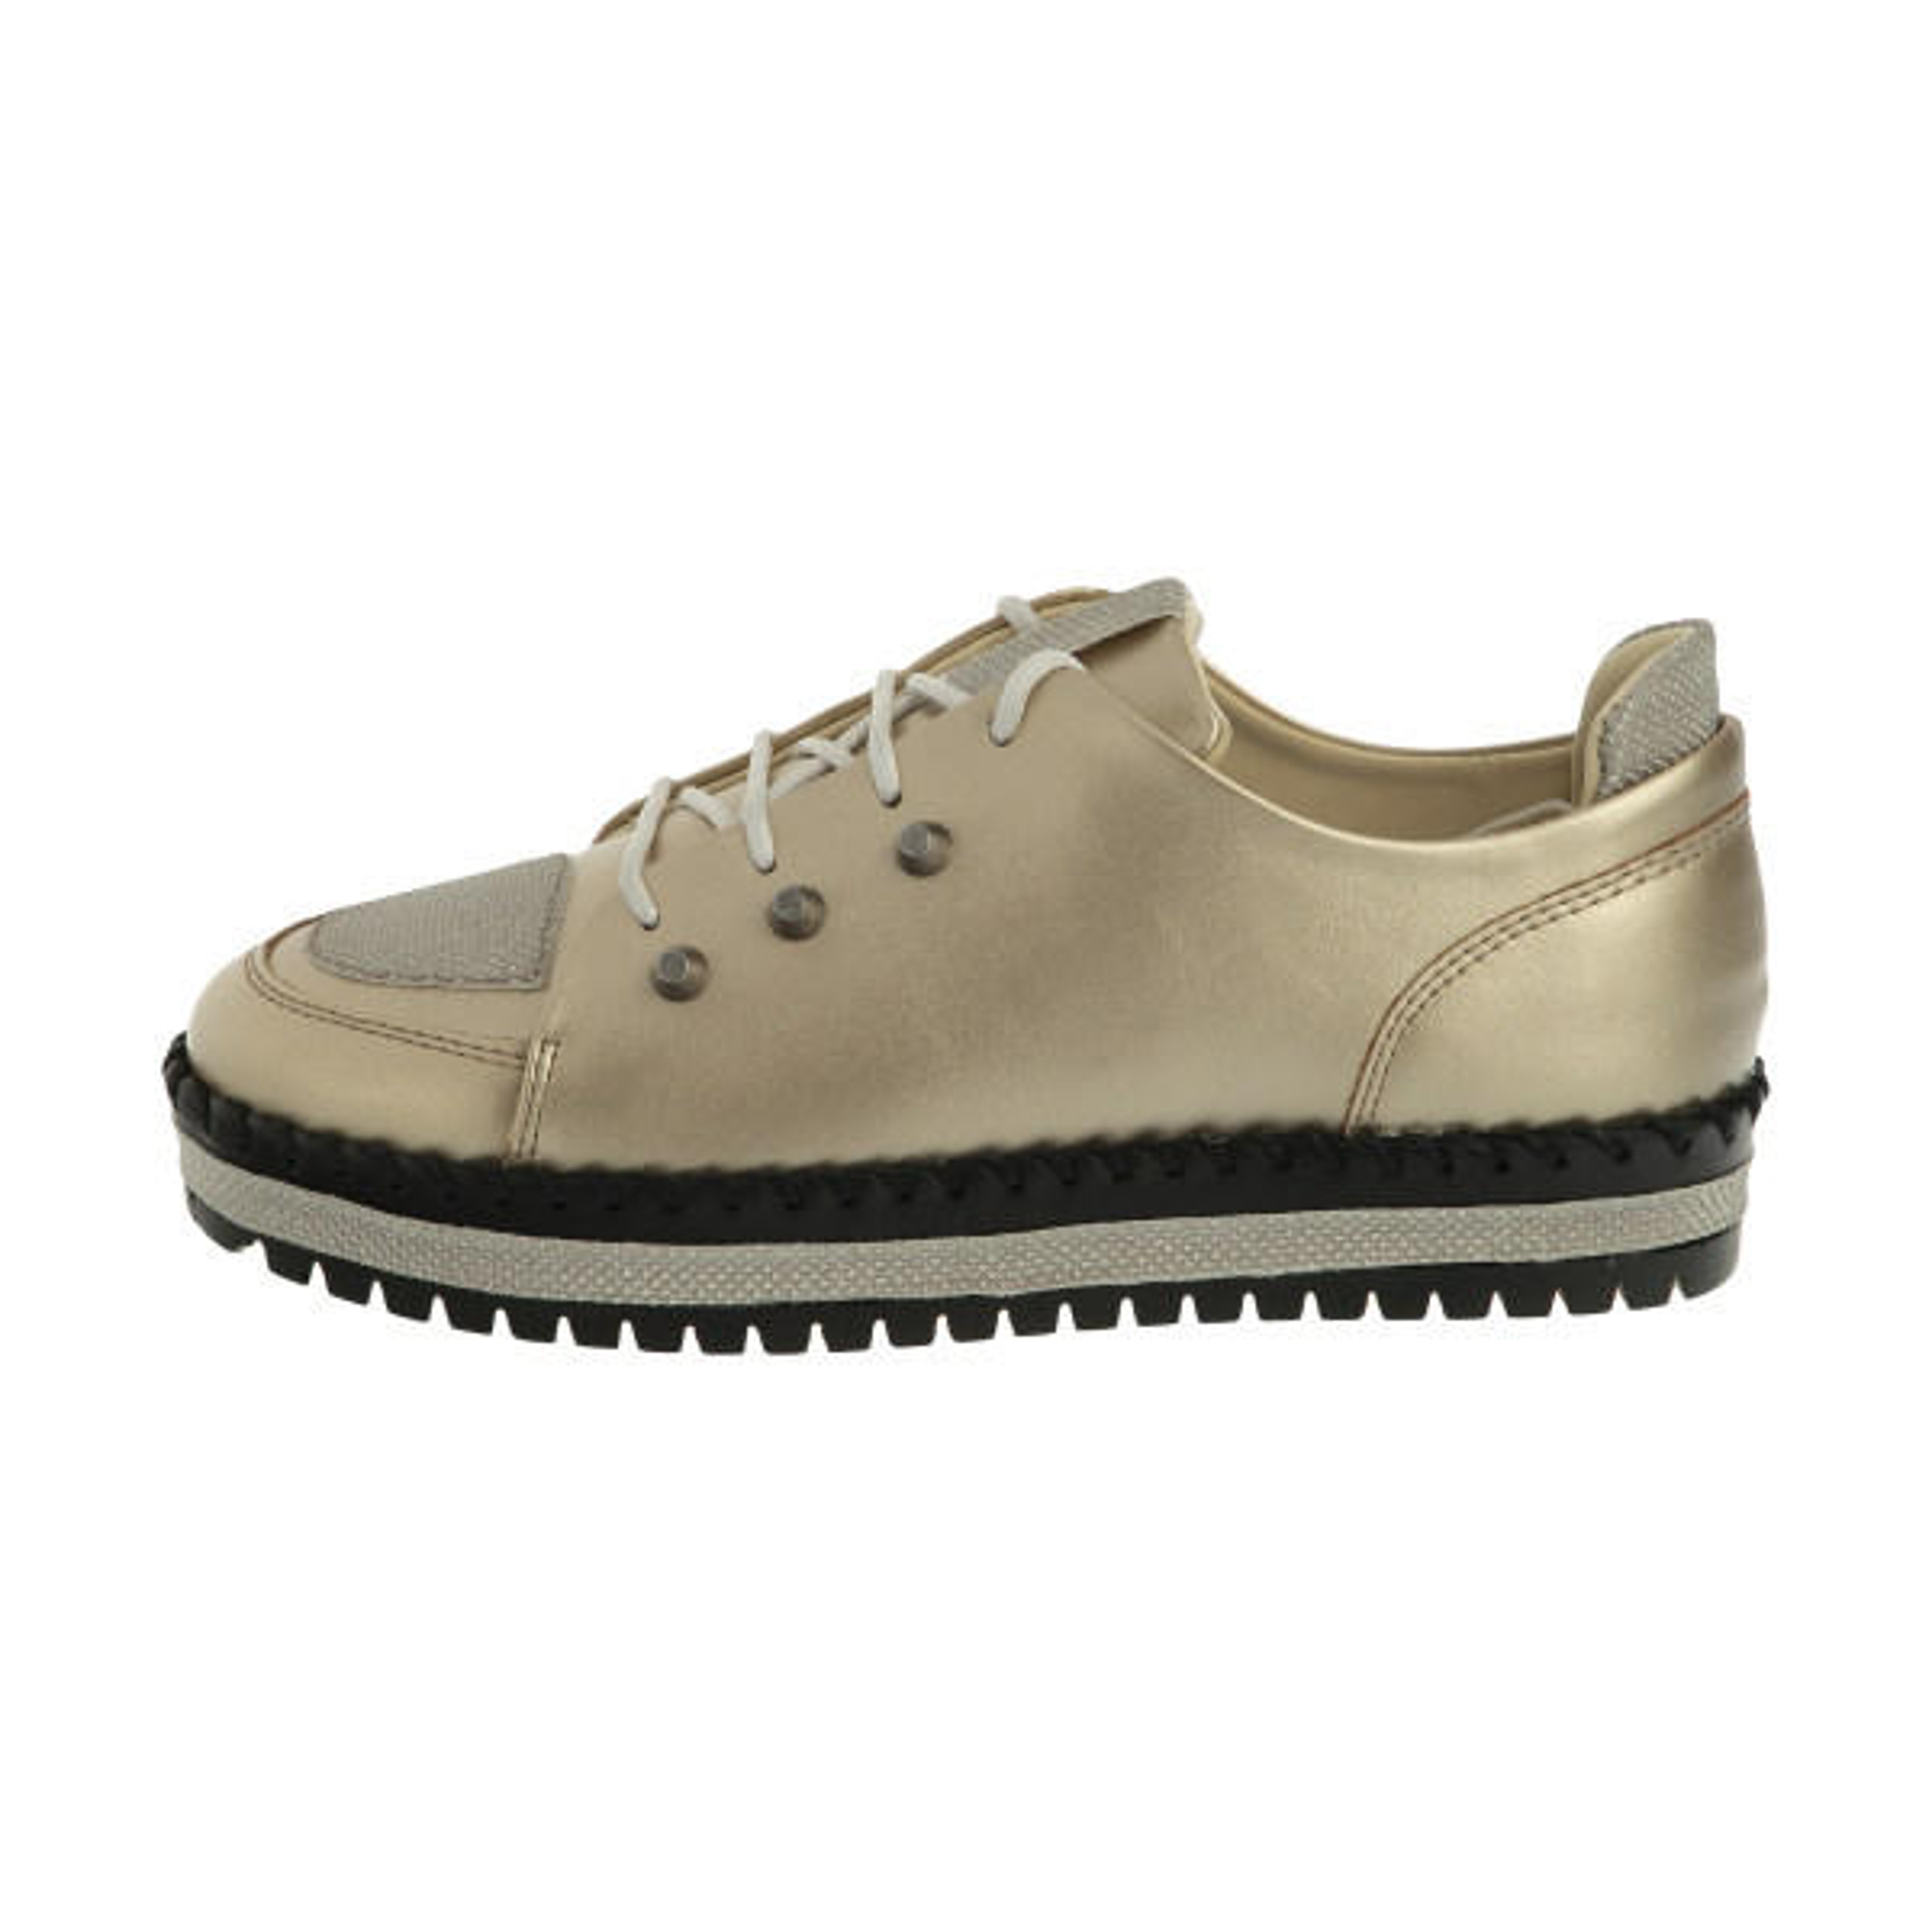 کفش روزمره زنانه ام تو مدل 1004-17